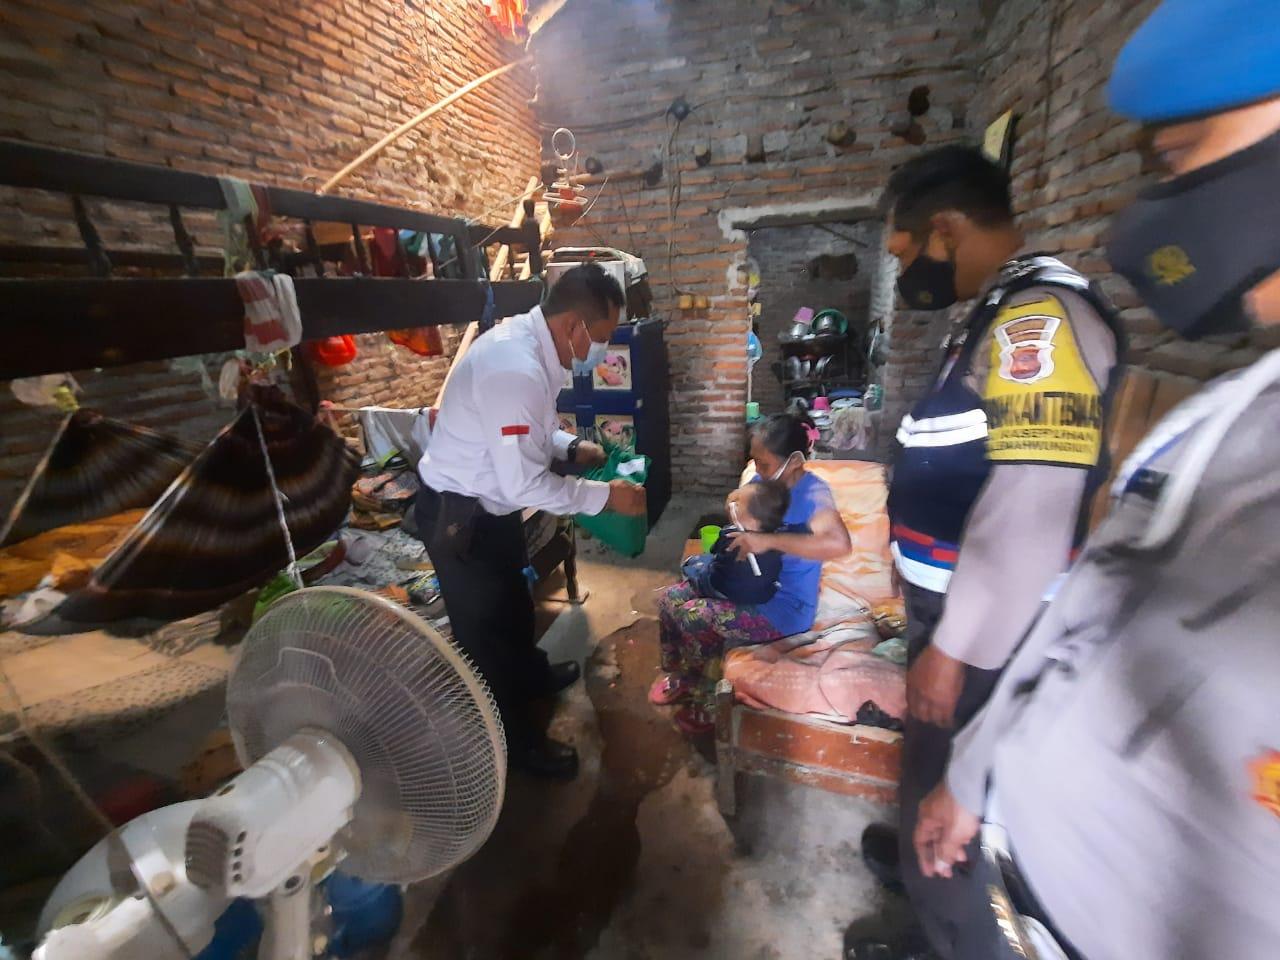 Berbagi Kasih, Polsek Lemahwungkuk Polres Ciko Gelar Baksos ke Orang Jompo